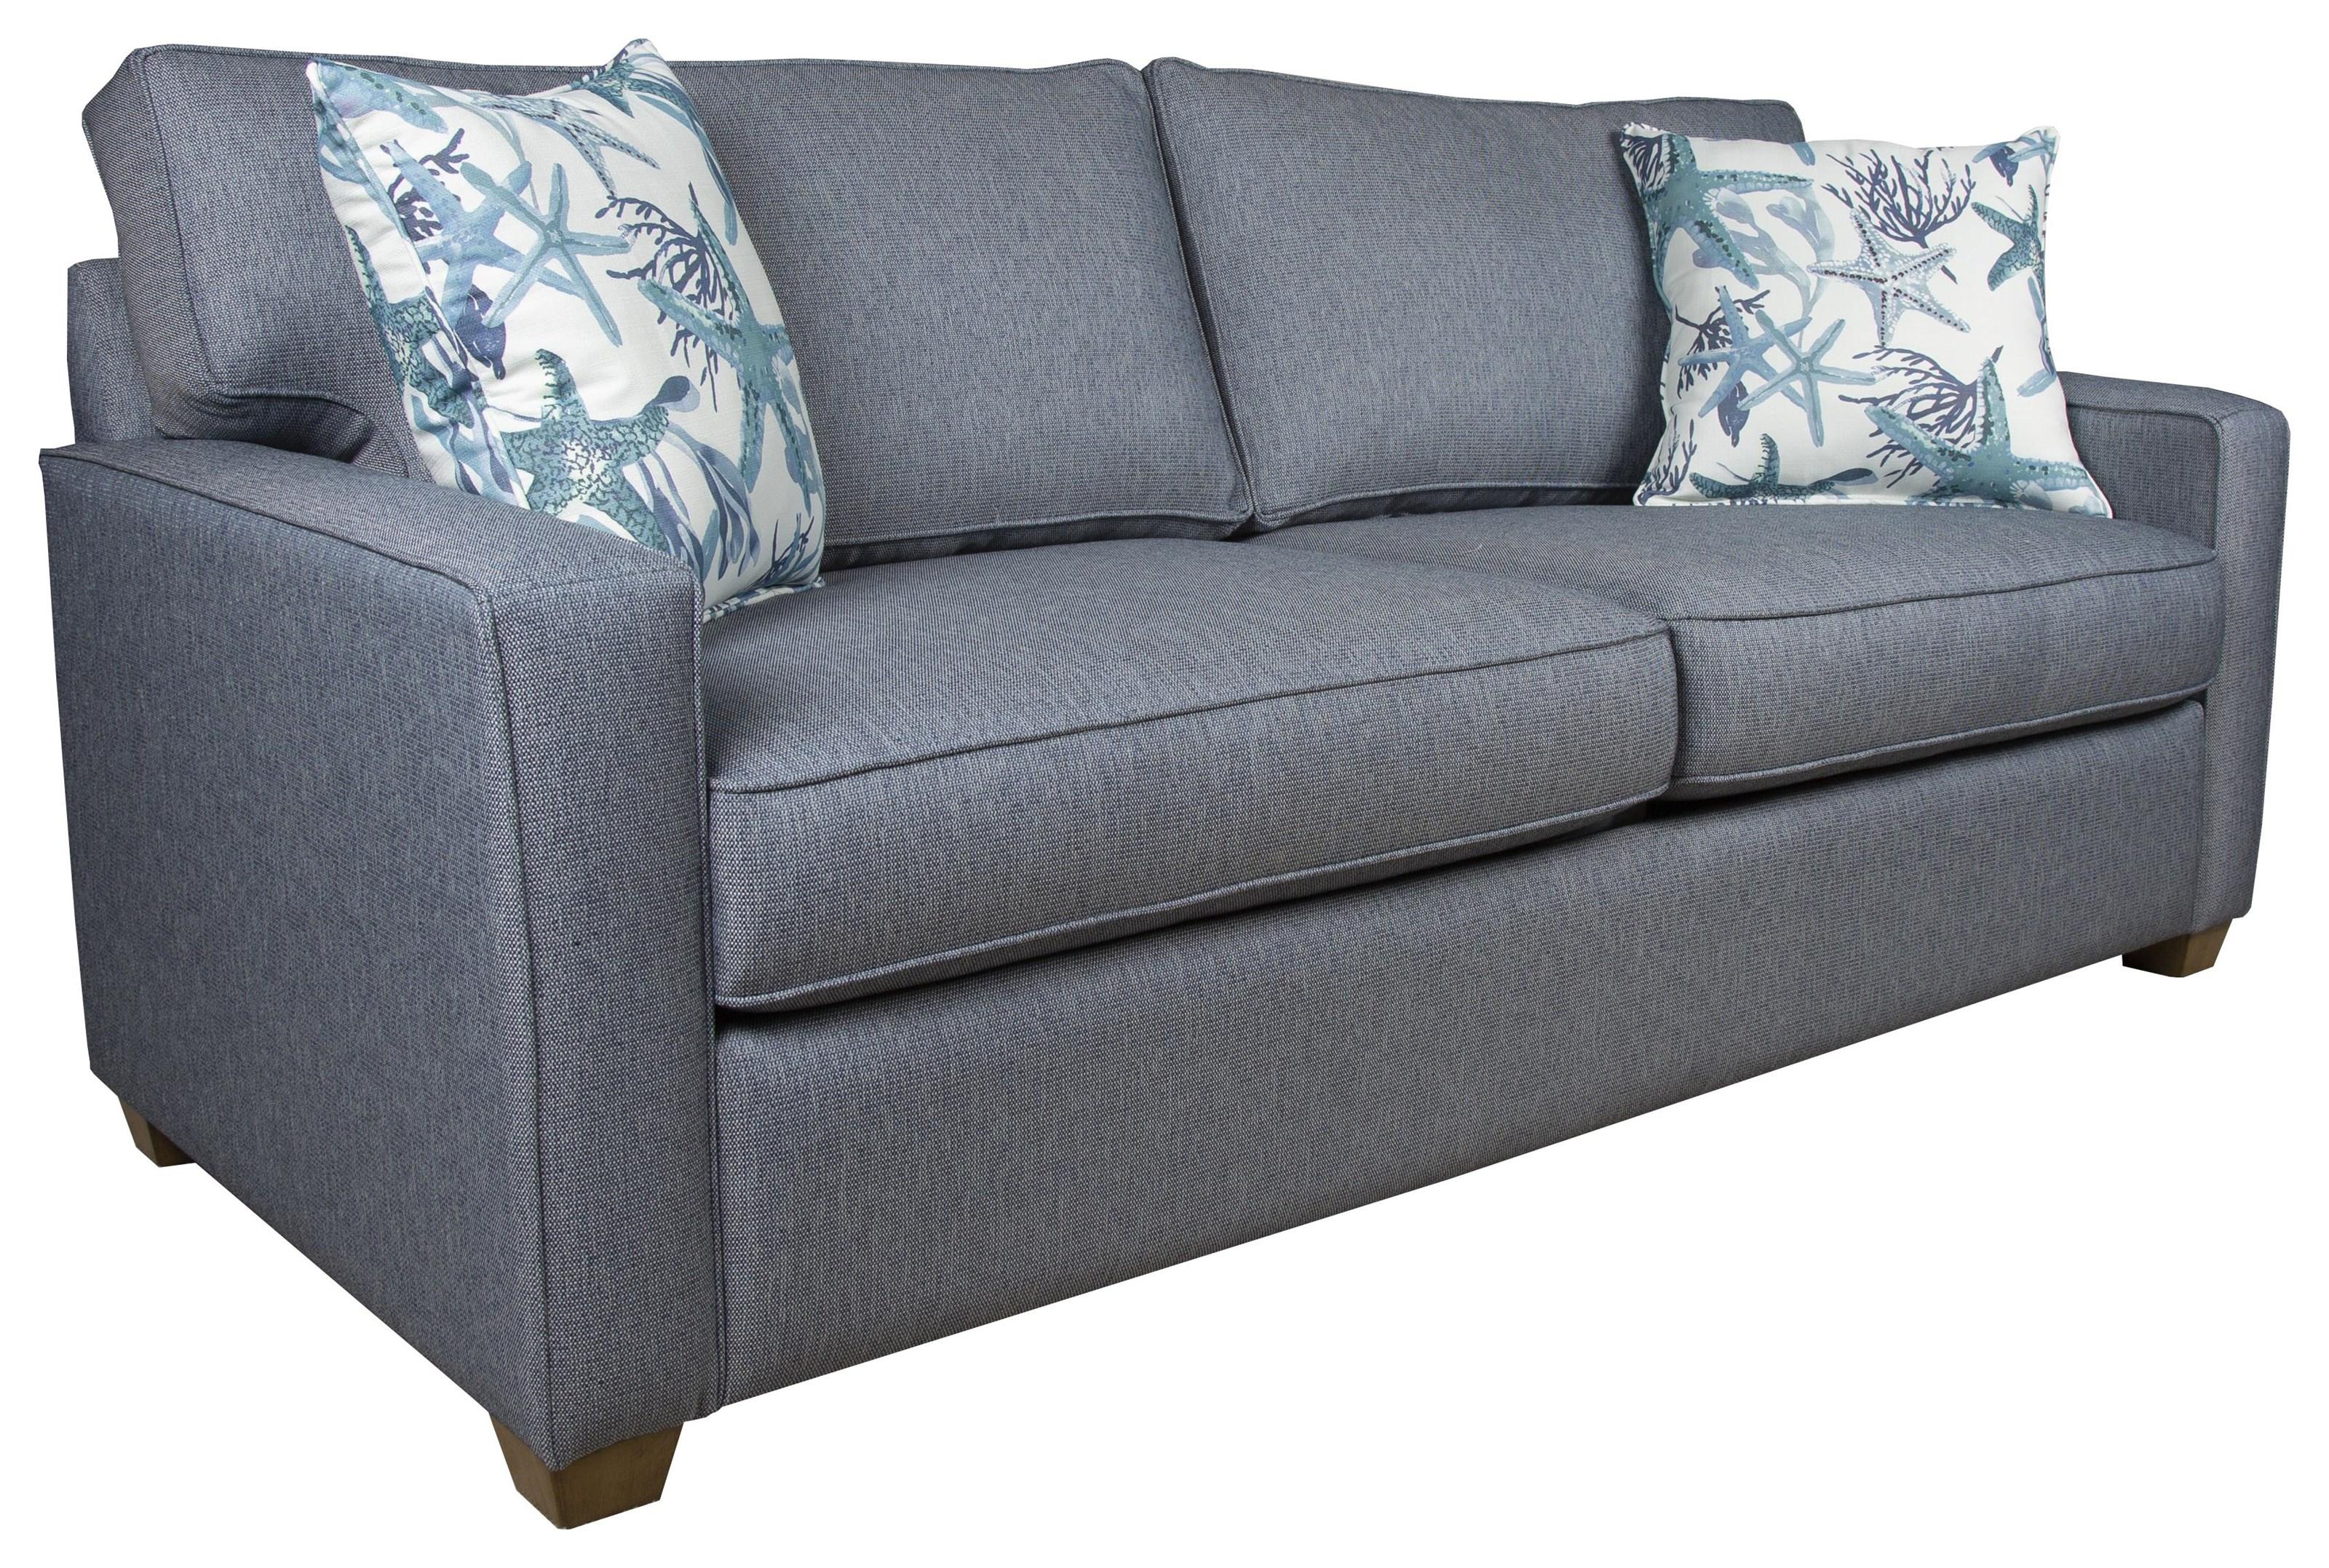 146 Sleeper Sofa by Capris Furniture at Baer's Furniture